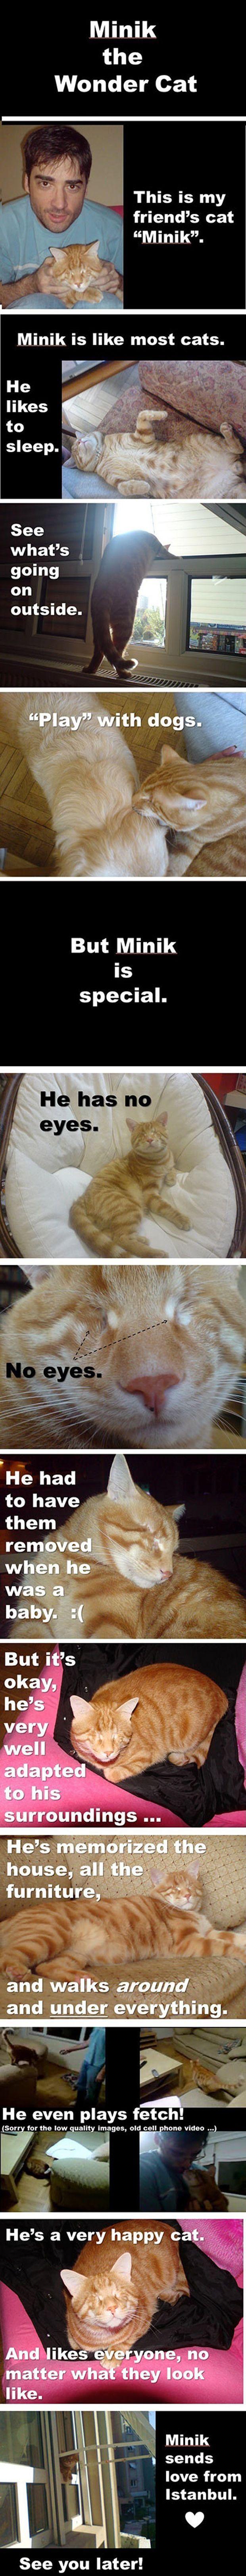 Meet Minik The Wonder Cat – 13 Pics